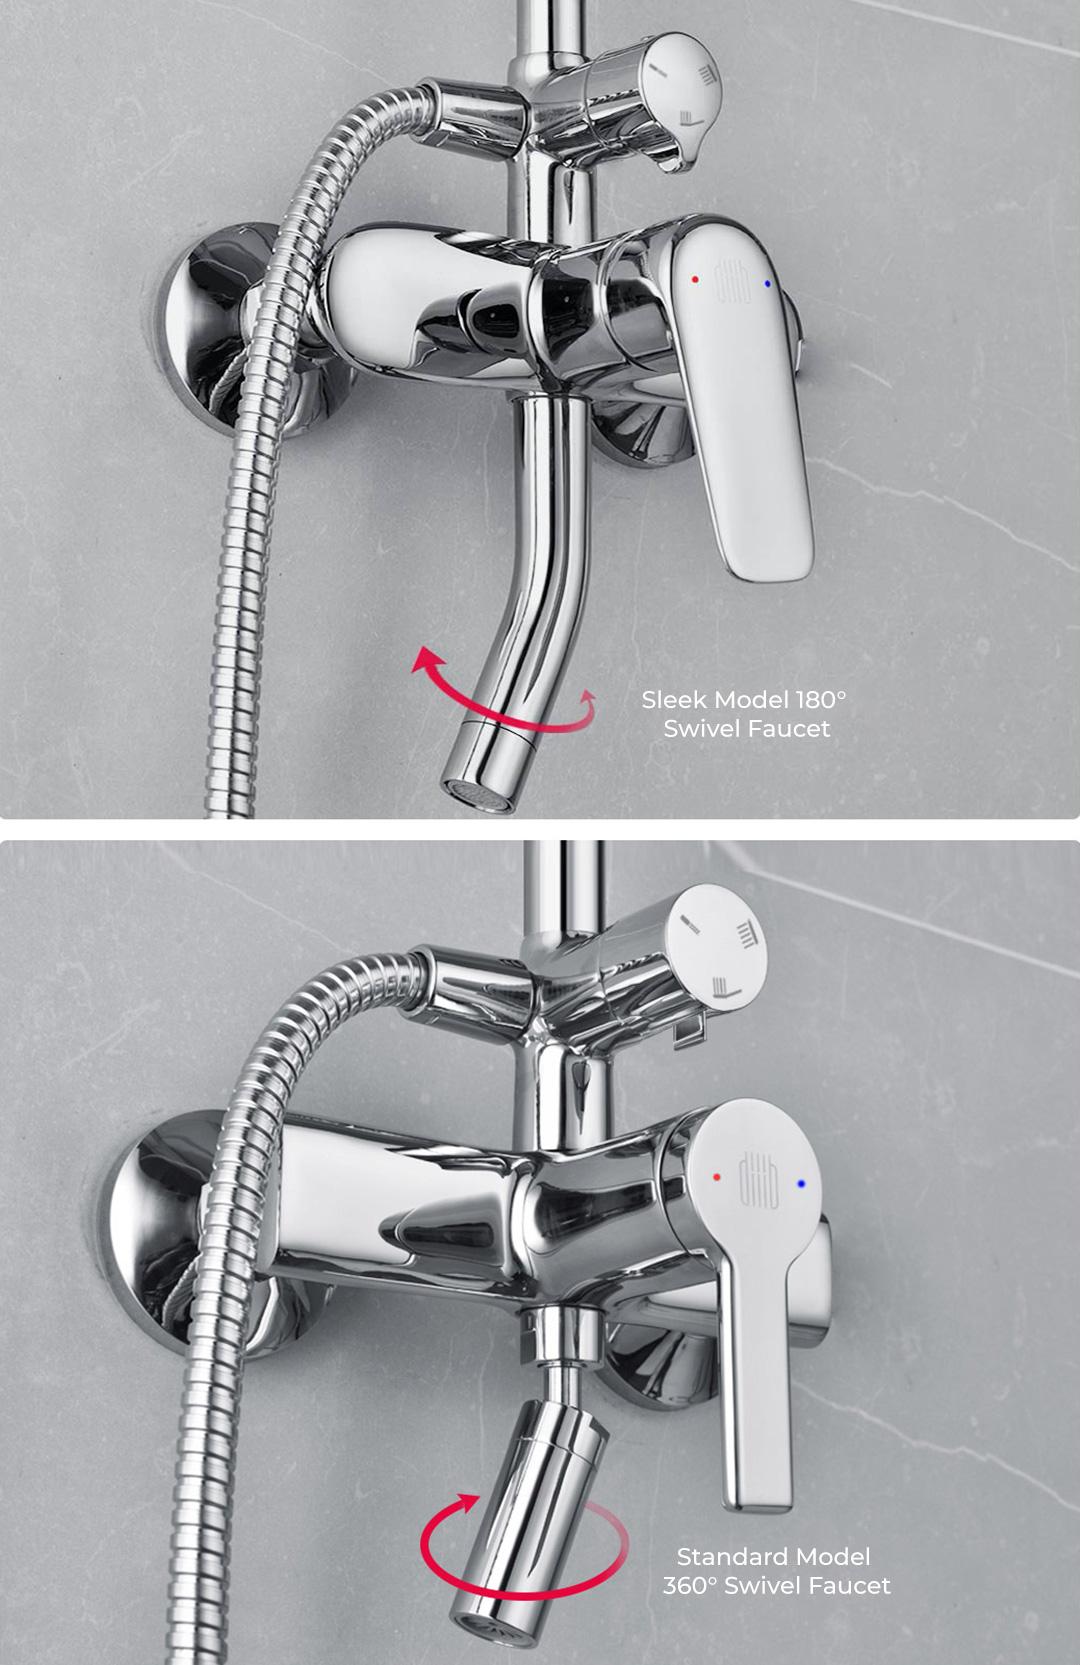 Xiaomi Diiib Shower Set With Bidet Sprayer